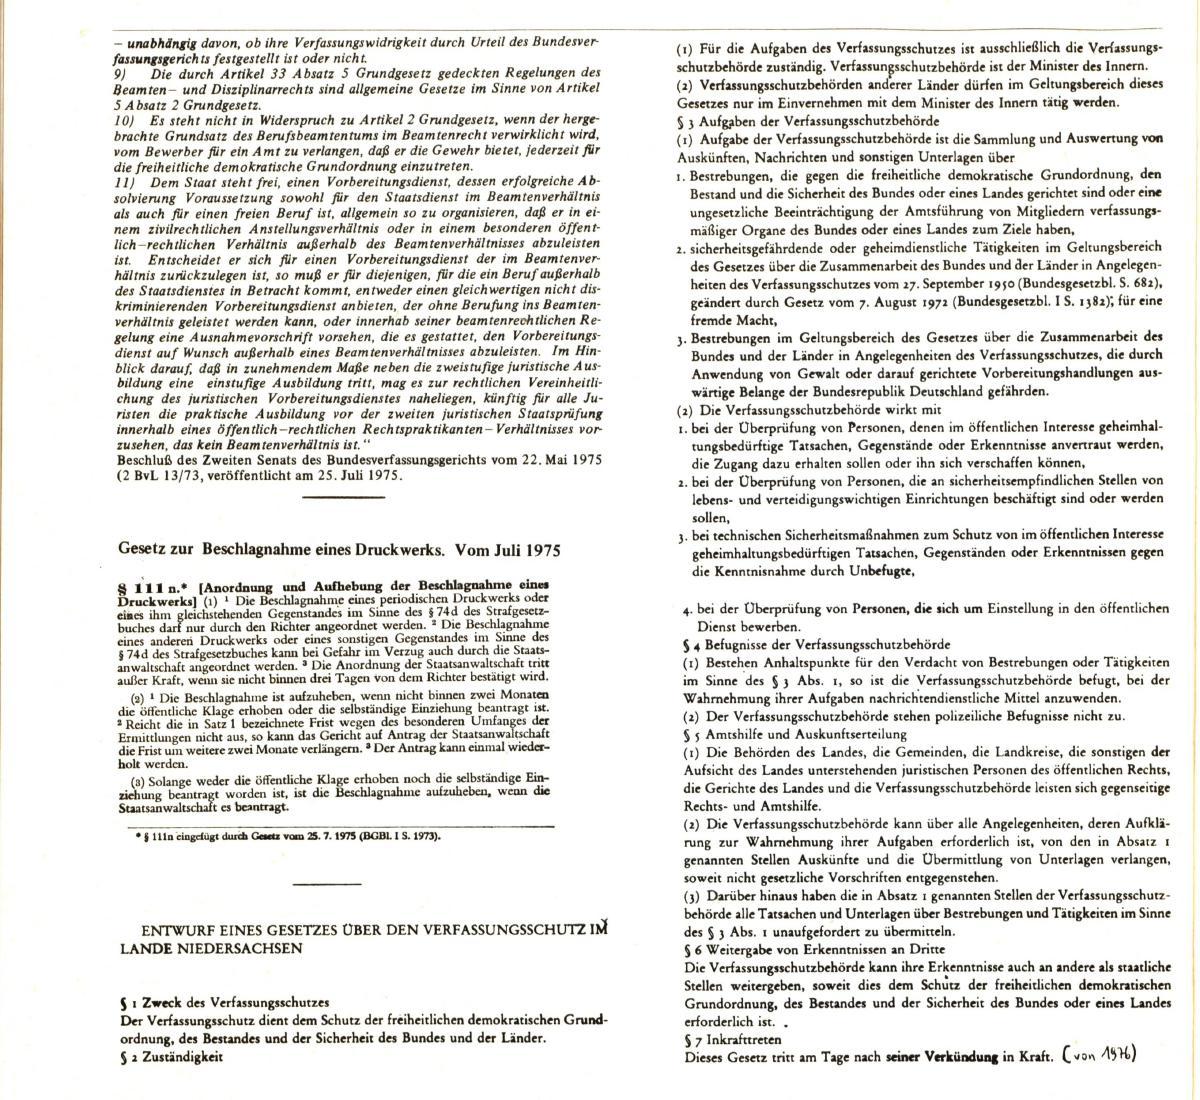 REP_VLB_1976_Die_Zensurgesetze_47